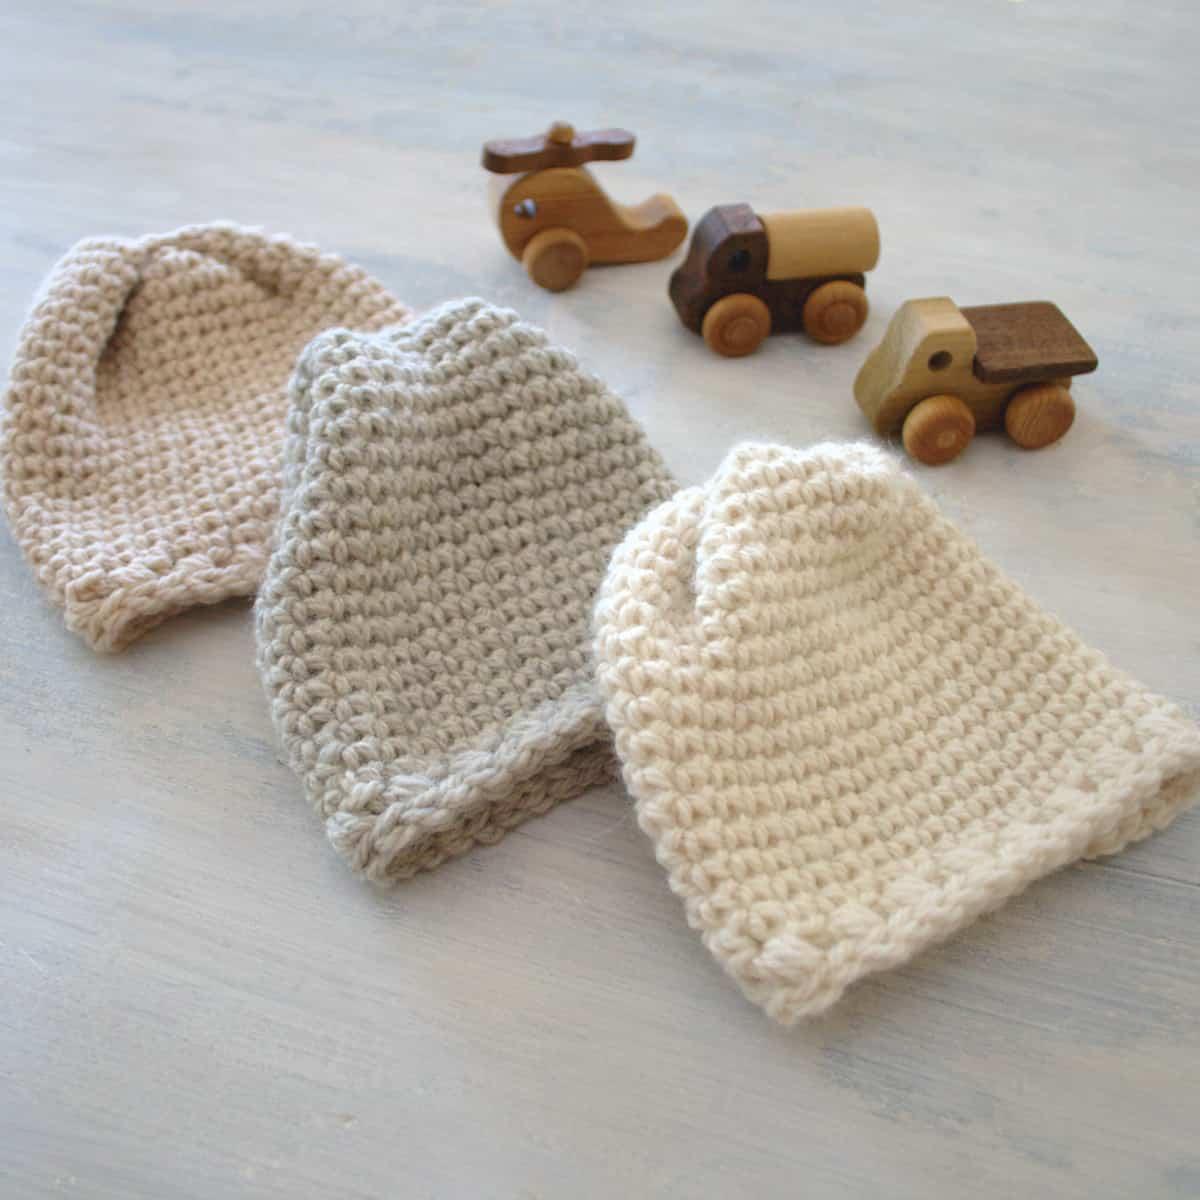 3 Motifs of Easy Crochet Oval Rug Pattern Adorable Sugar Sprout Newborn Hat Pattern Crochet Life